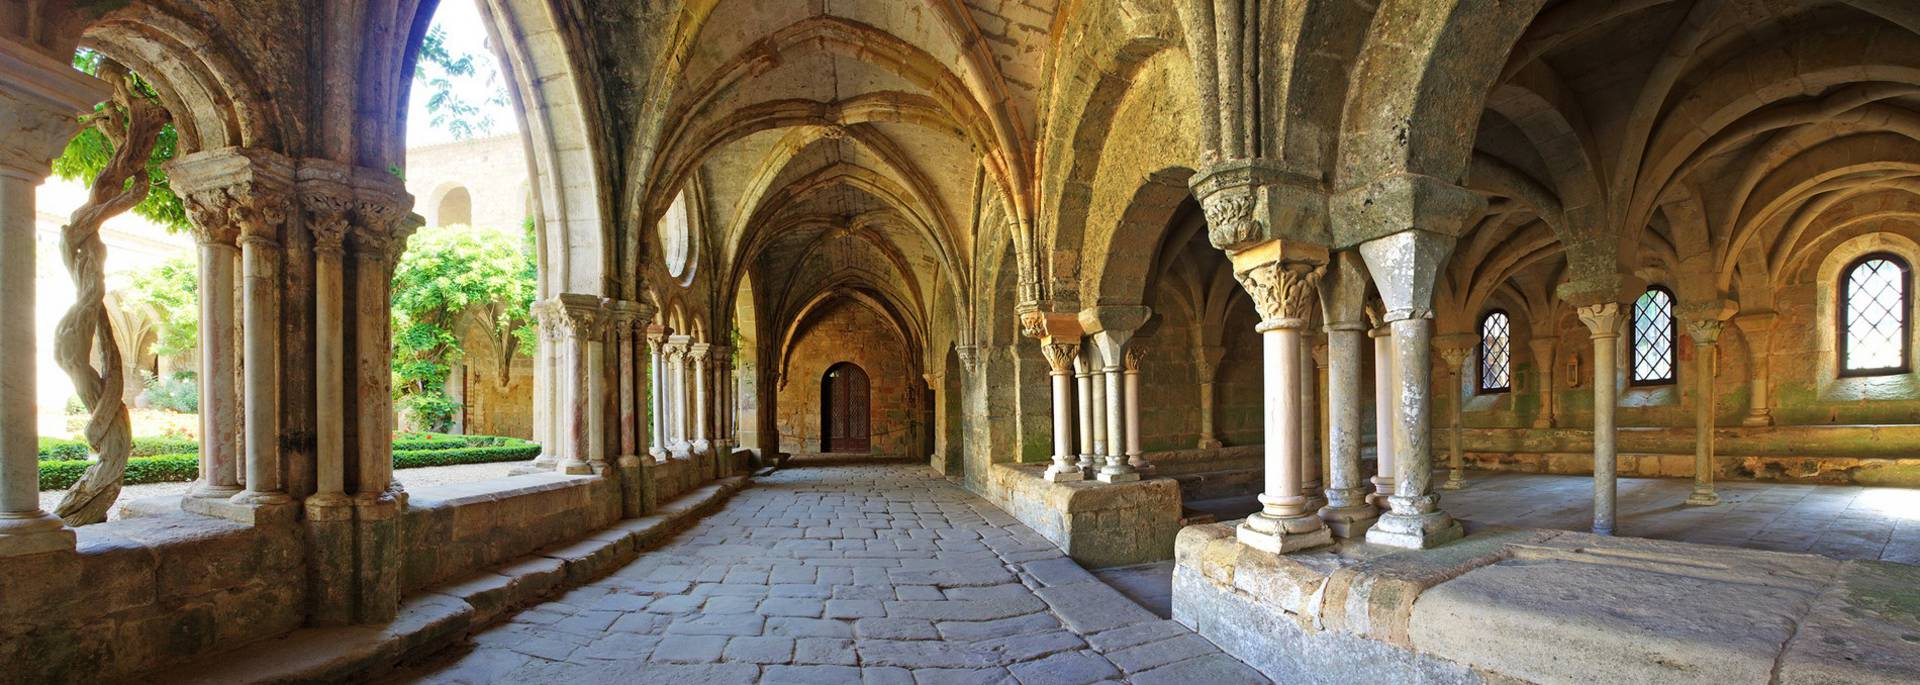 Abbaye de Fontfroide, cloître